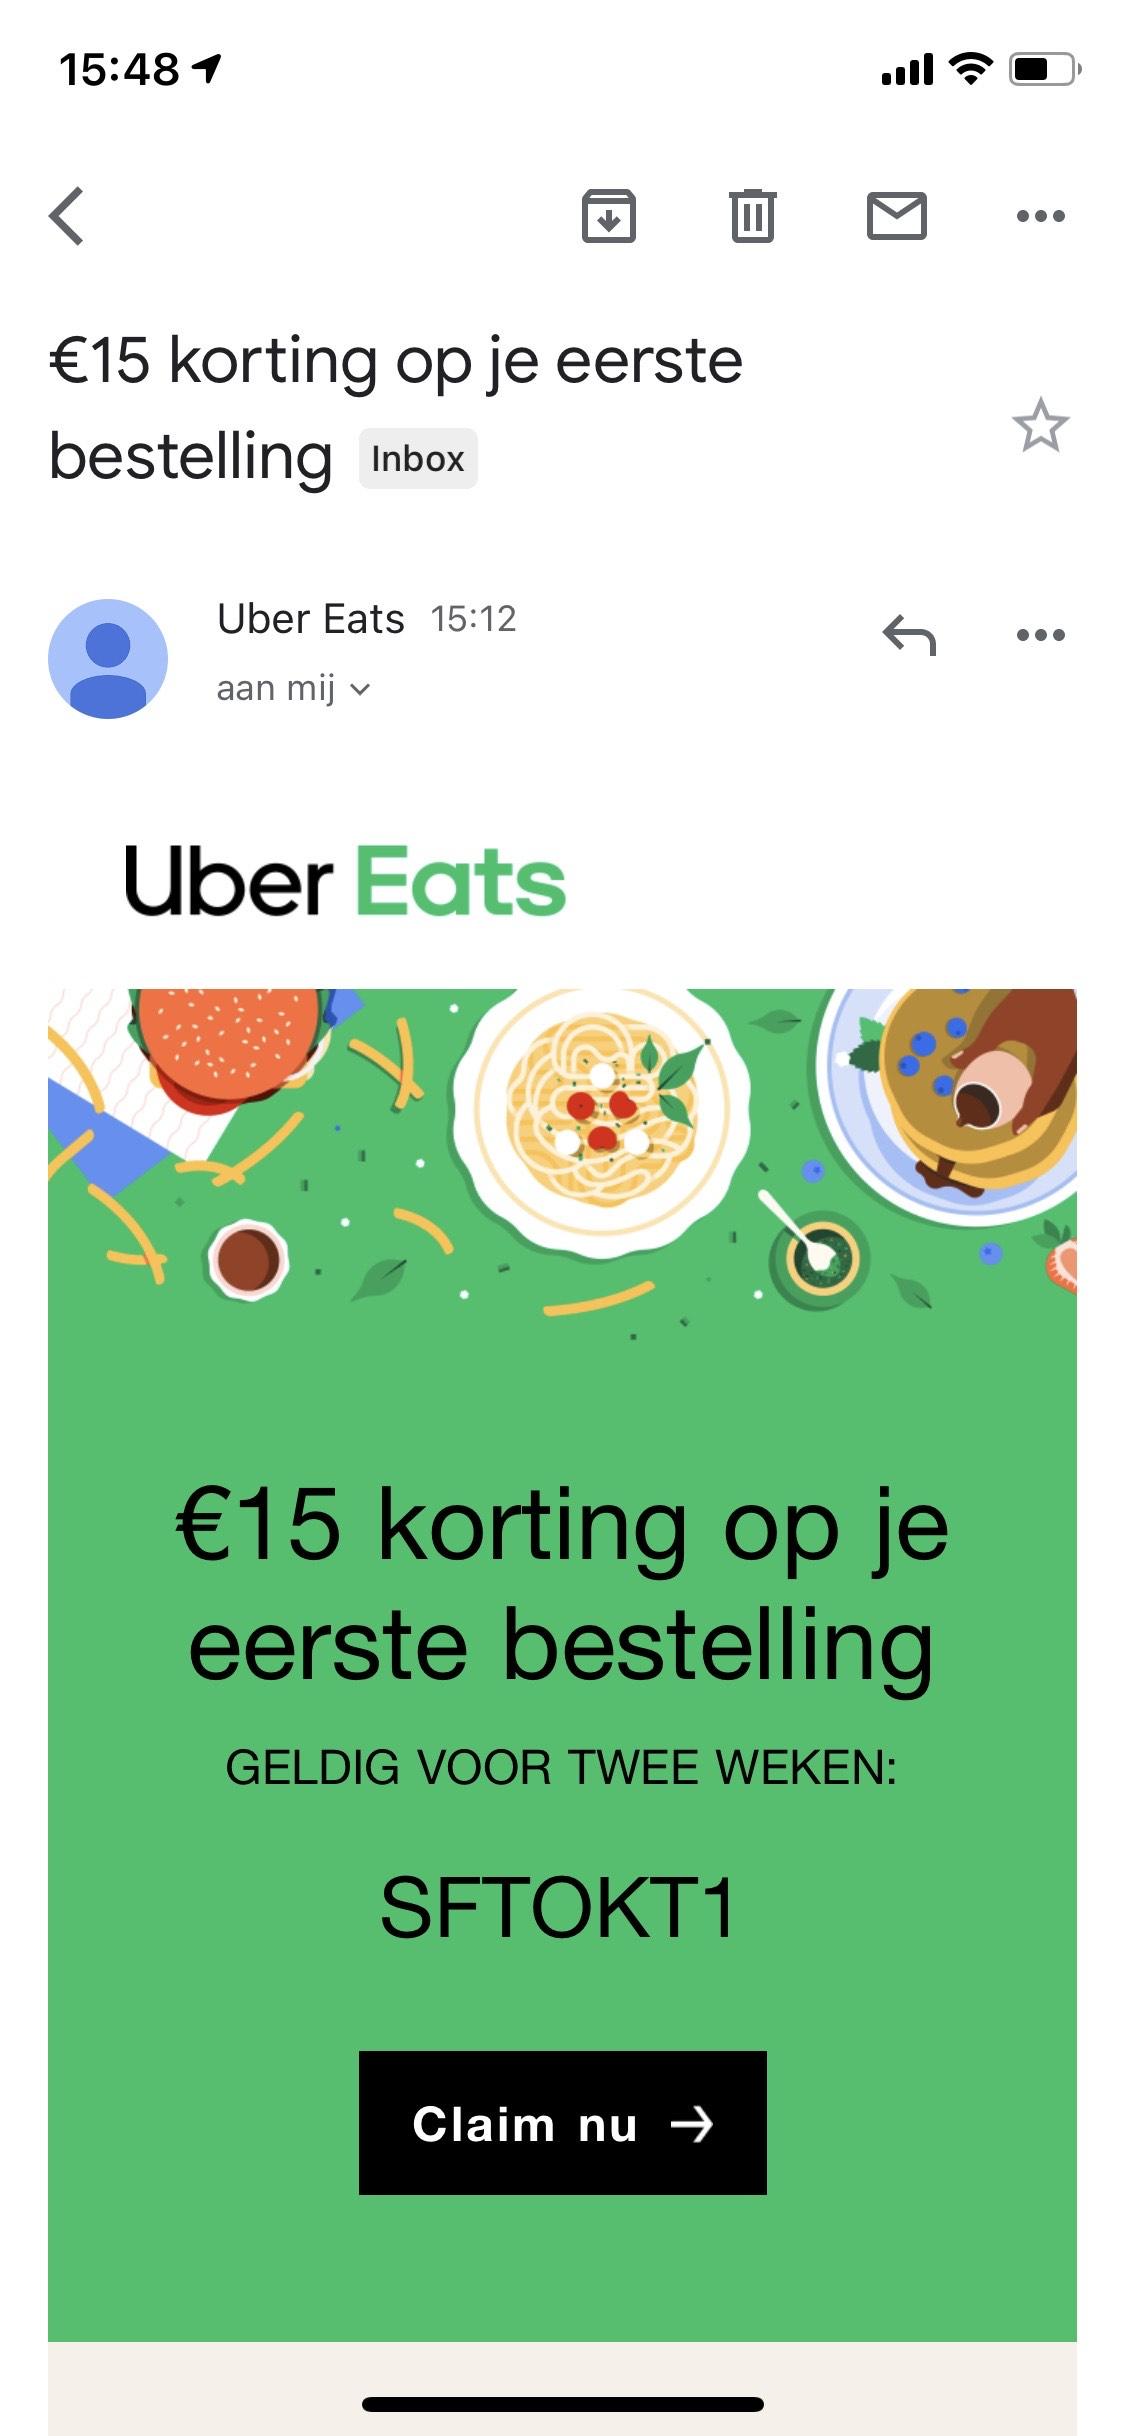 T.w.v. 100 euro Uber Eats bestellen en slechts 25 euro betalen